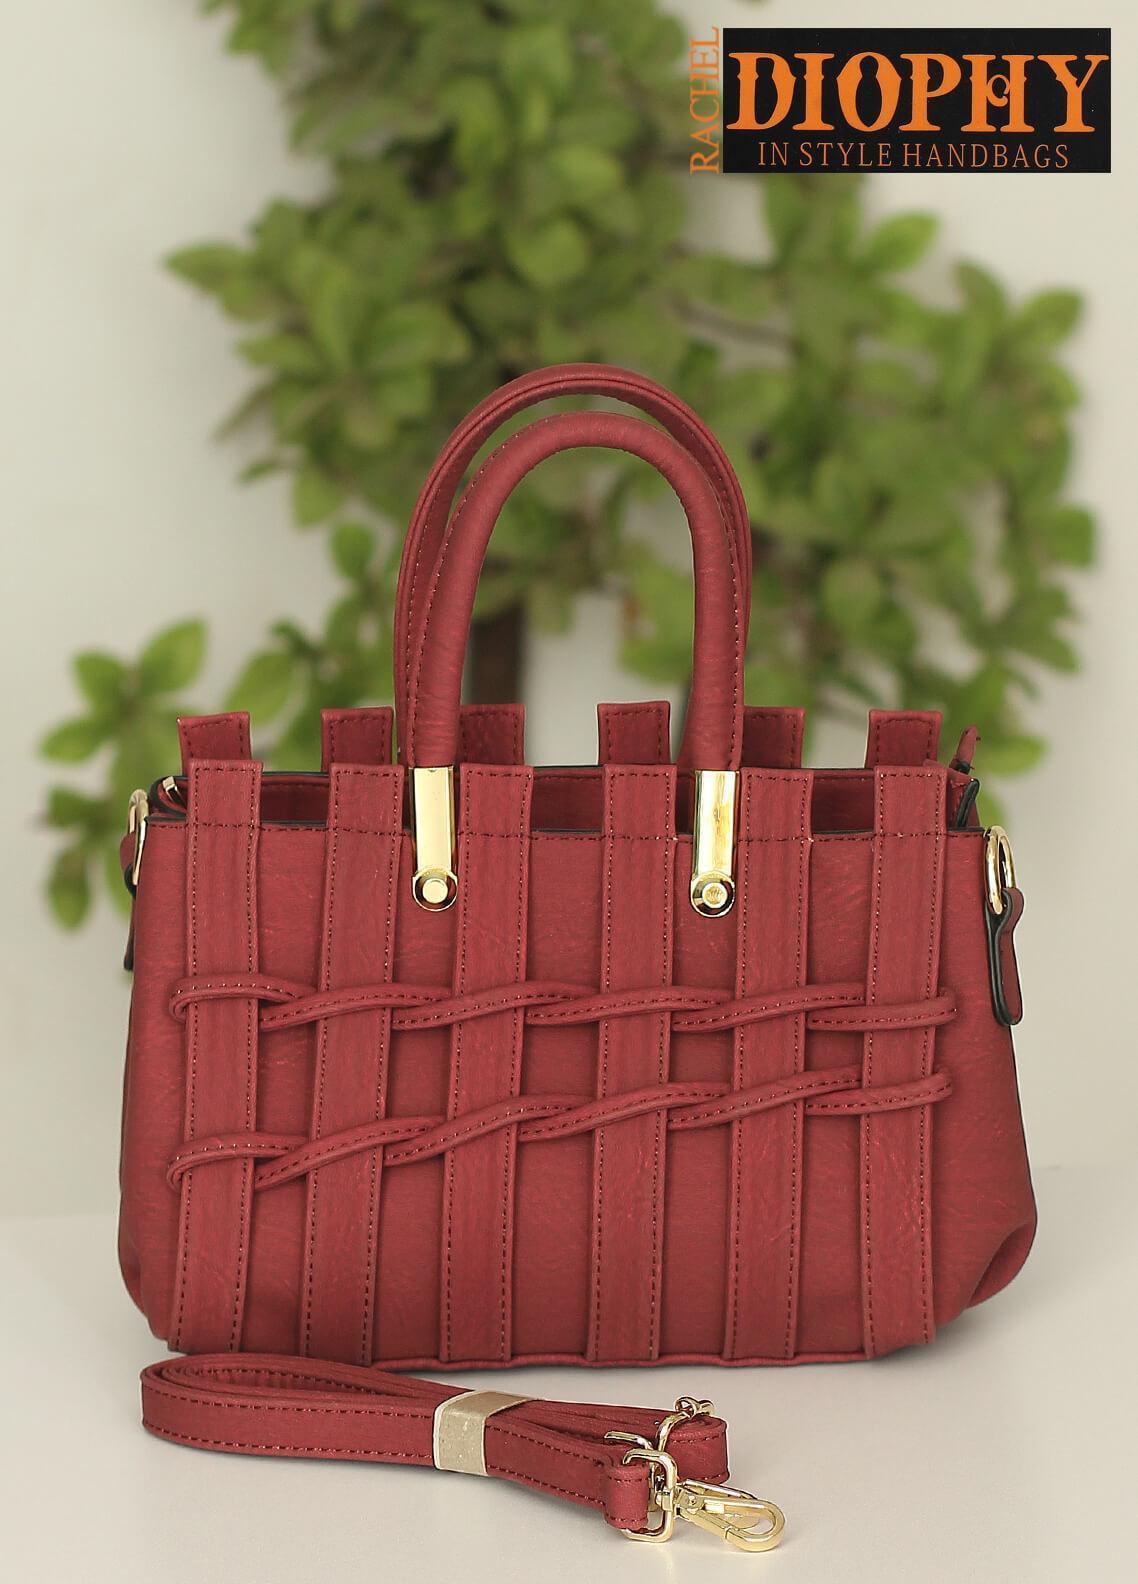 Rachel Diophy PU Leather Satchels Handbags for Women - Purple with Plain Textured